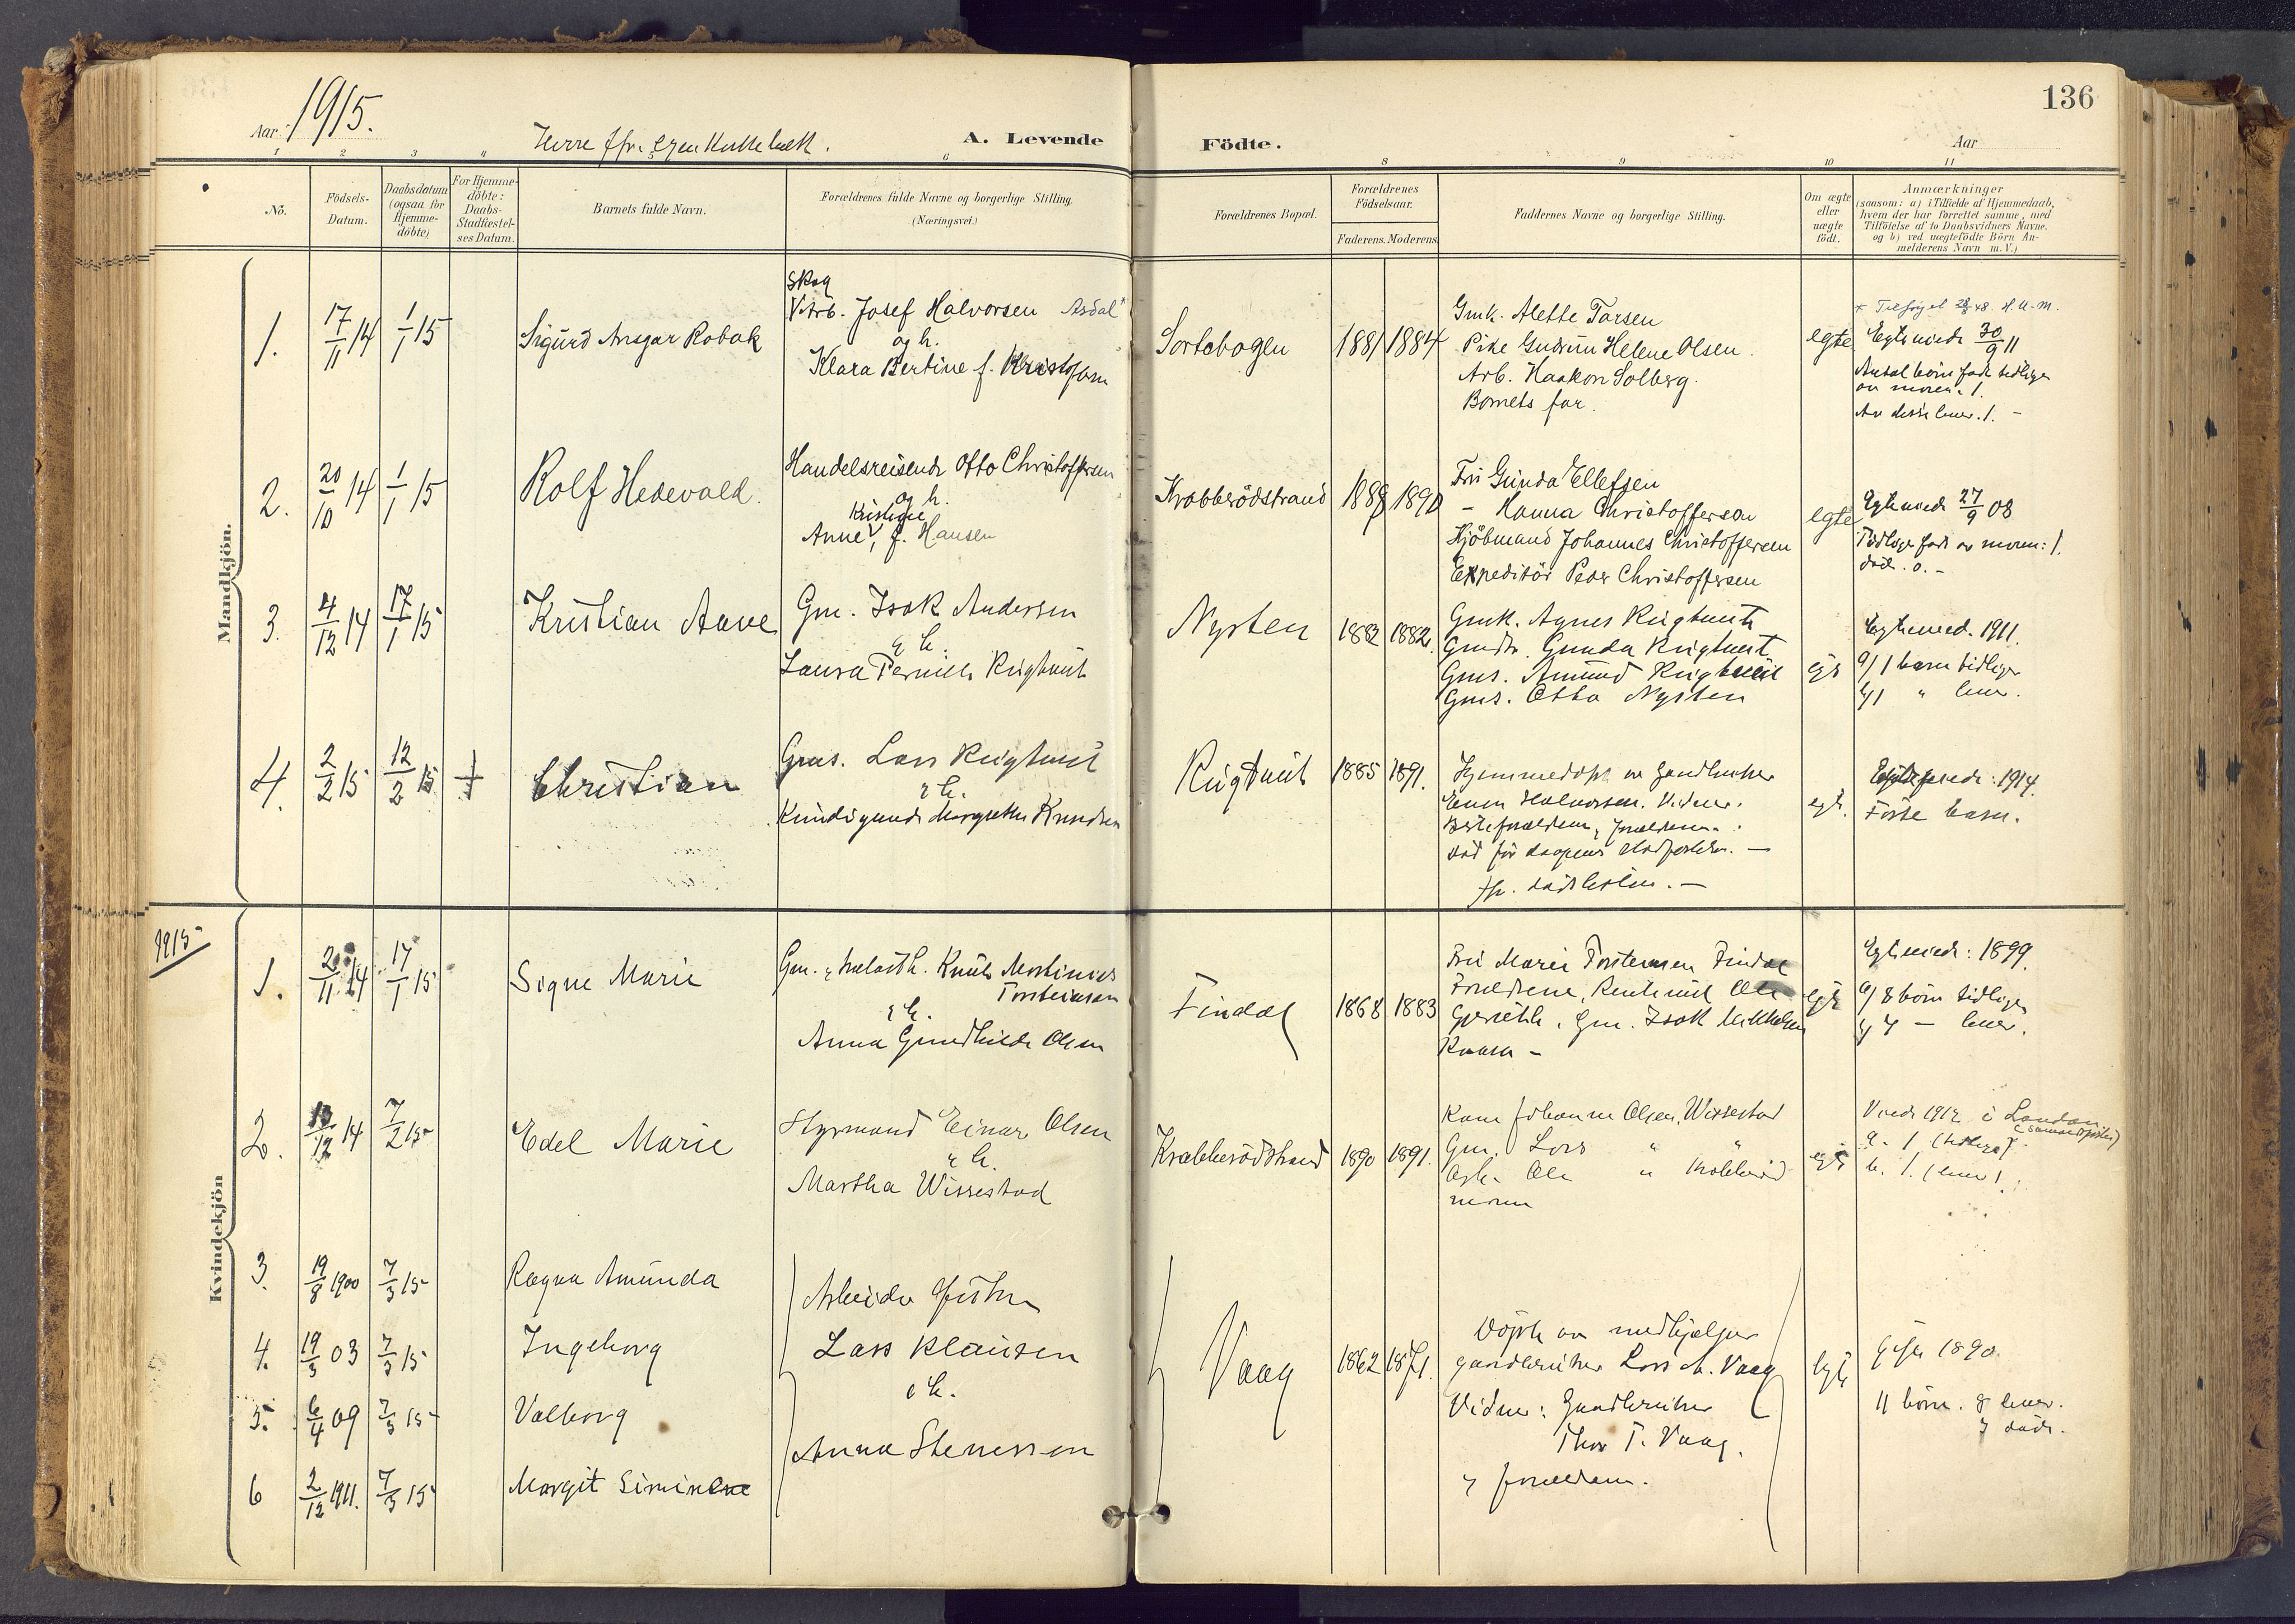 SAKO, Bamble kirkebøker, F/Fa/L0009: Ministerialbok nr. I 9, 1901-1917, s. 136